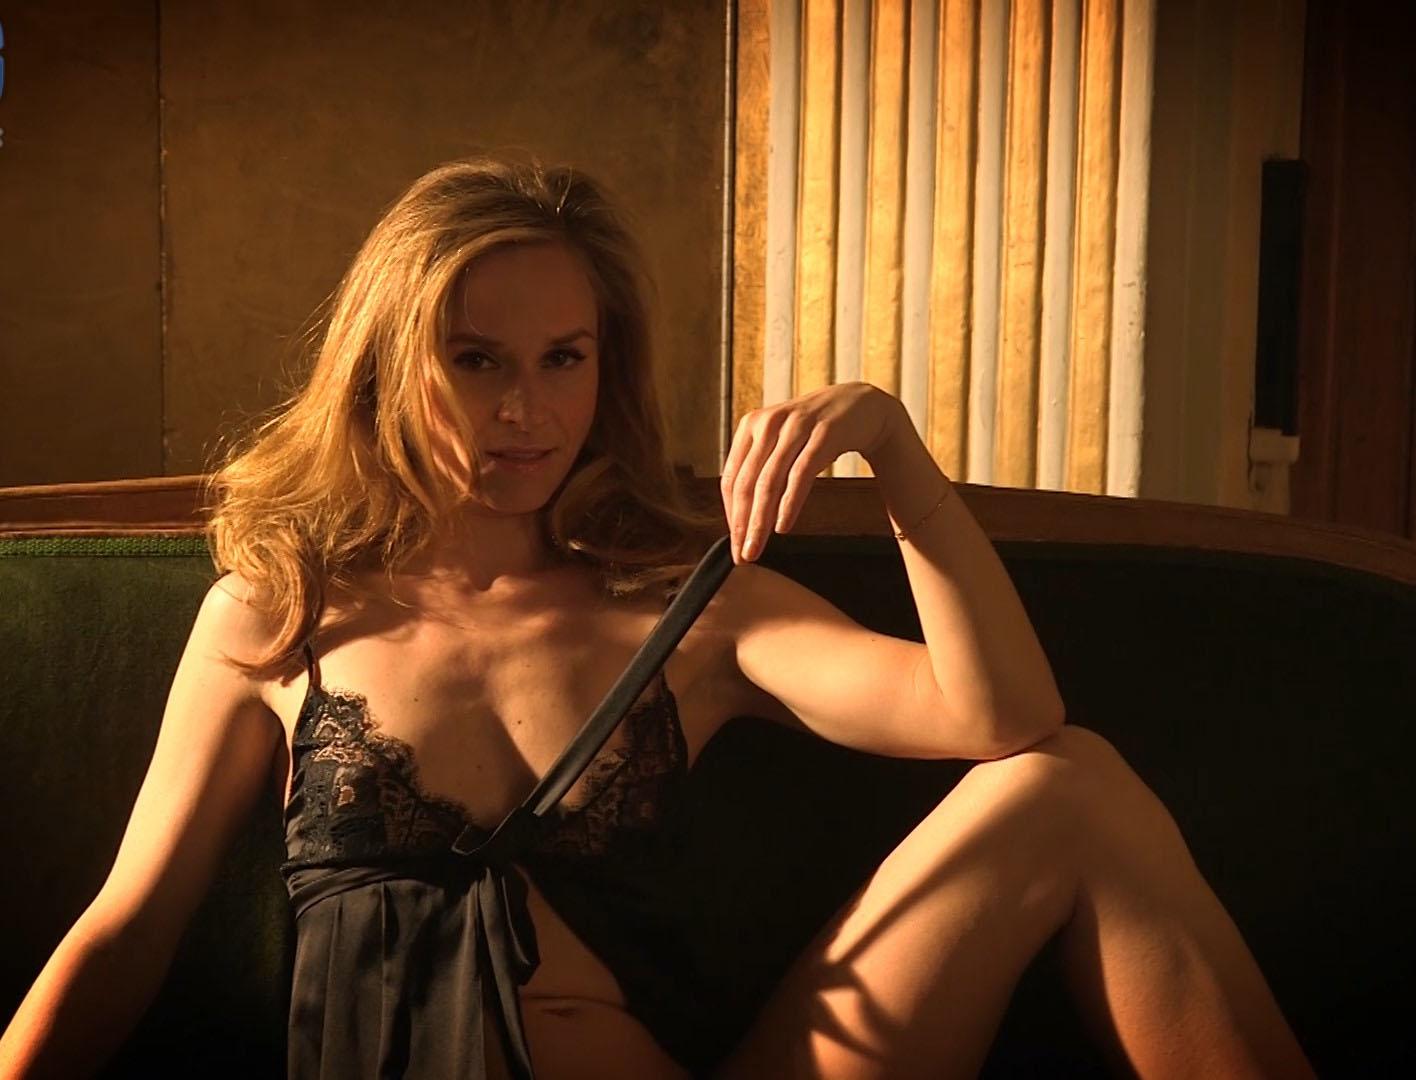 Аннет Фляйшер голая. Фото - 20